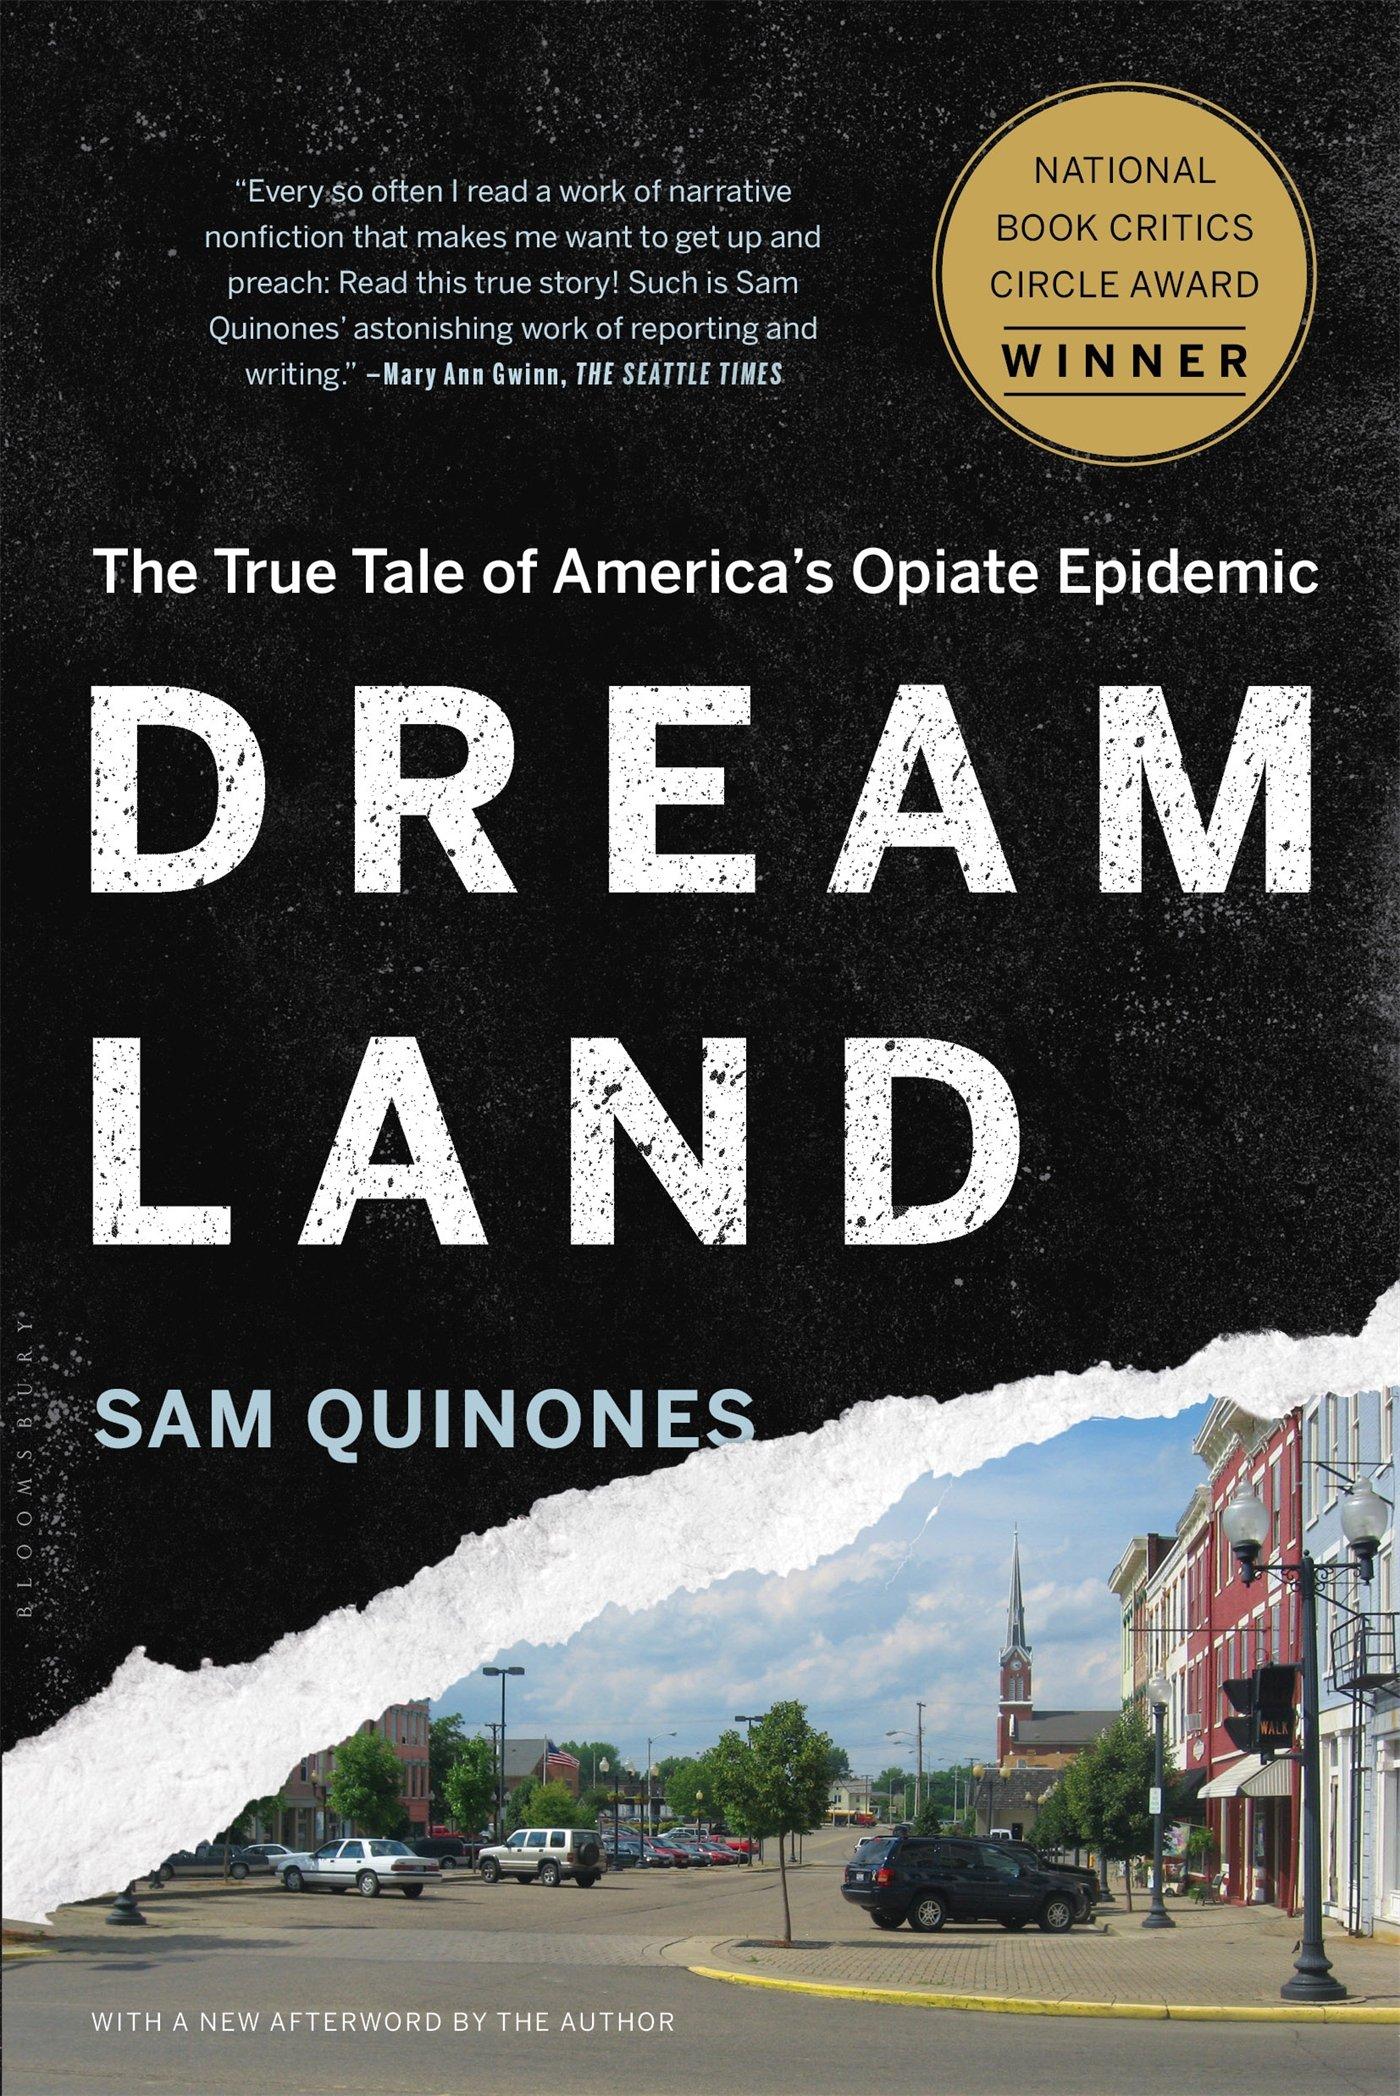 Dreamland: The True Tale of America's Opiate Epidemic by Sam Quinones